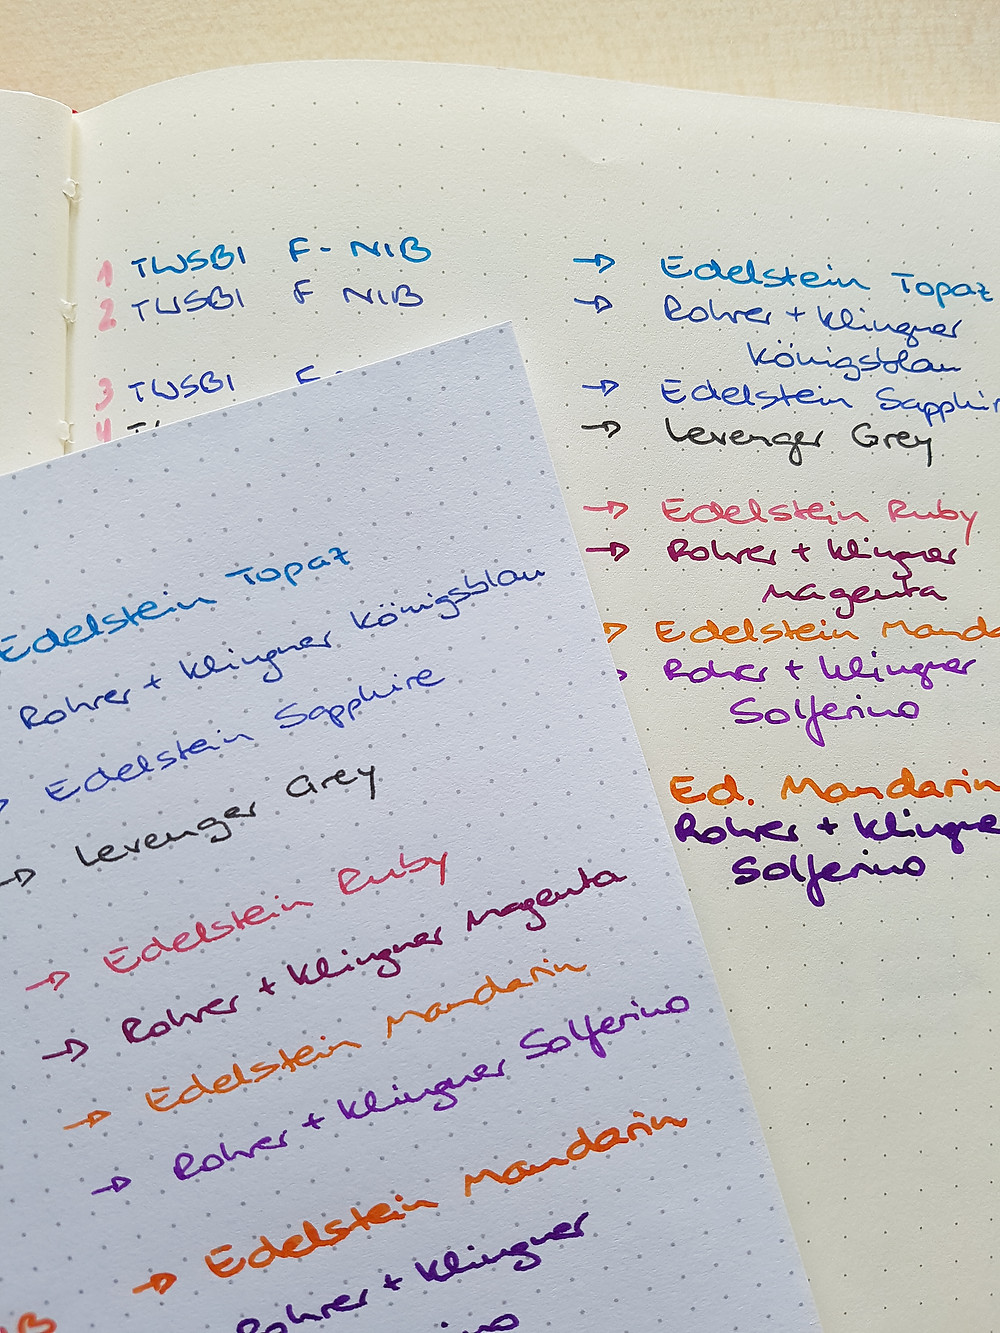 StickersSwissMade - blogpost - paper and pen test nbr 4 -  dotgrid.co notebooks_5